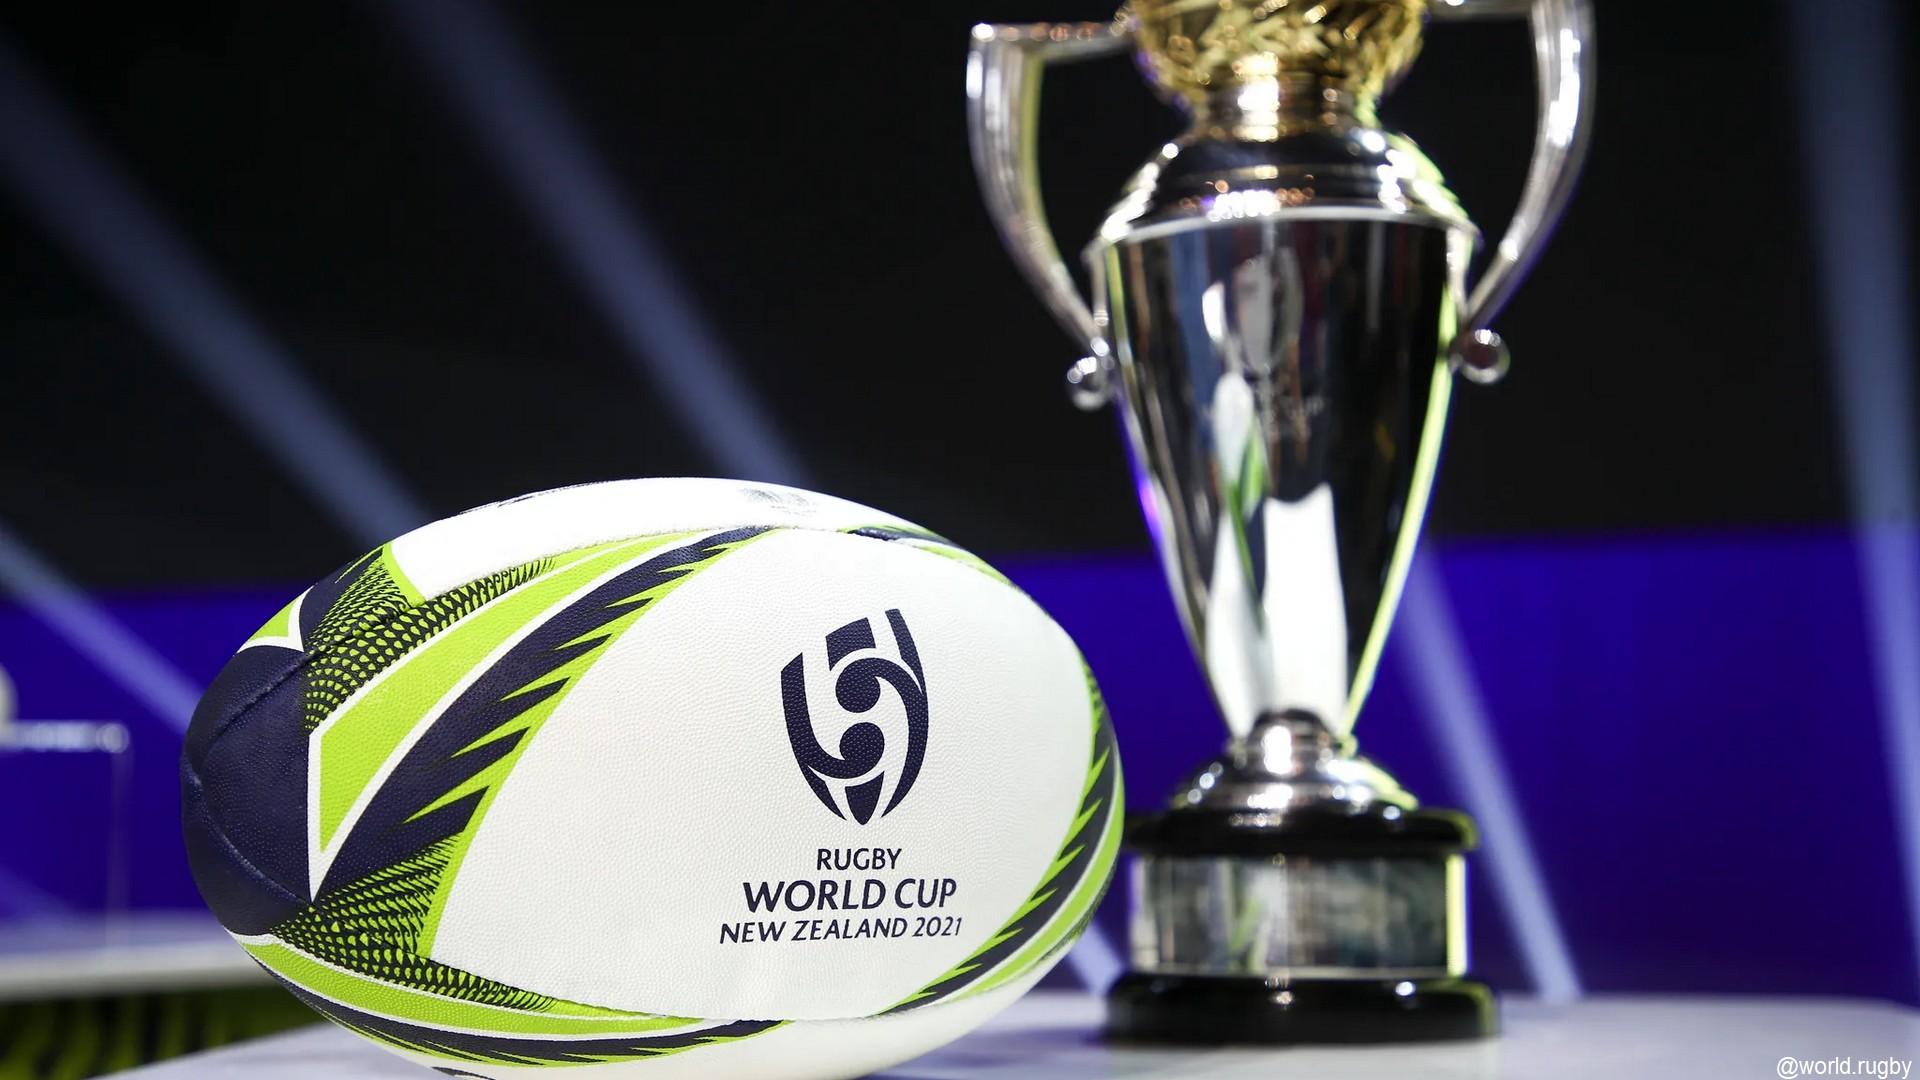 RWC NZL 2021 (1) Ballon rugby